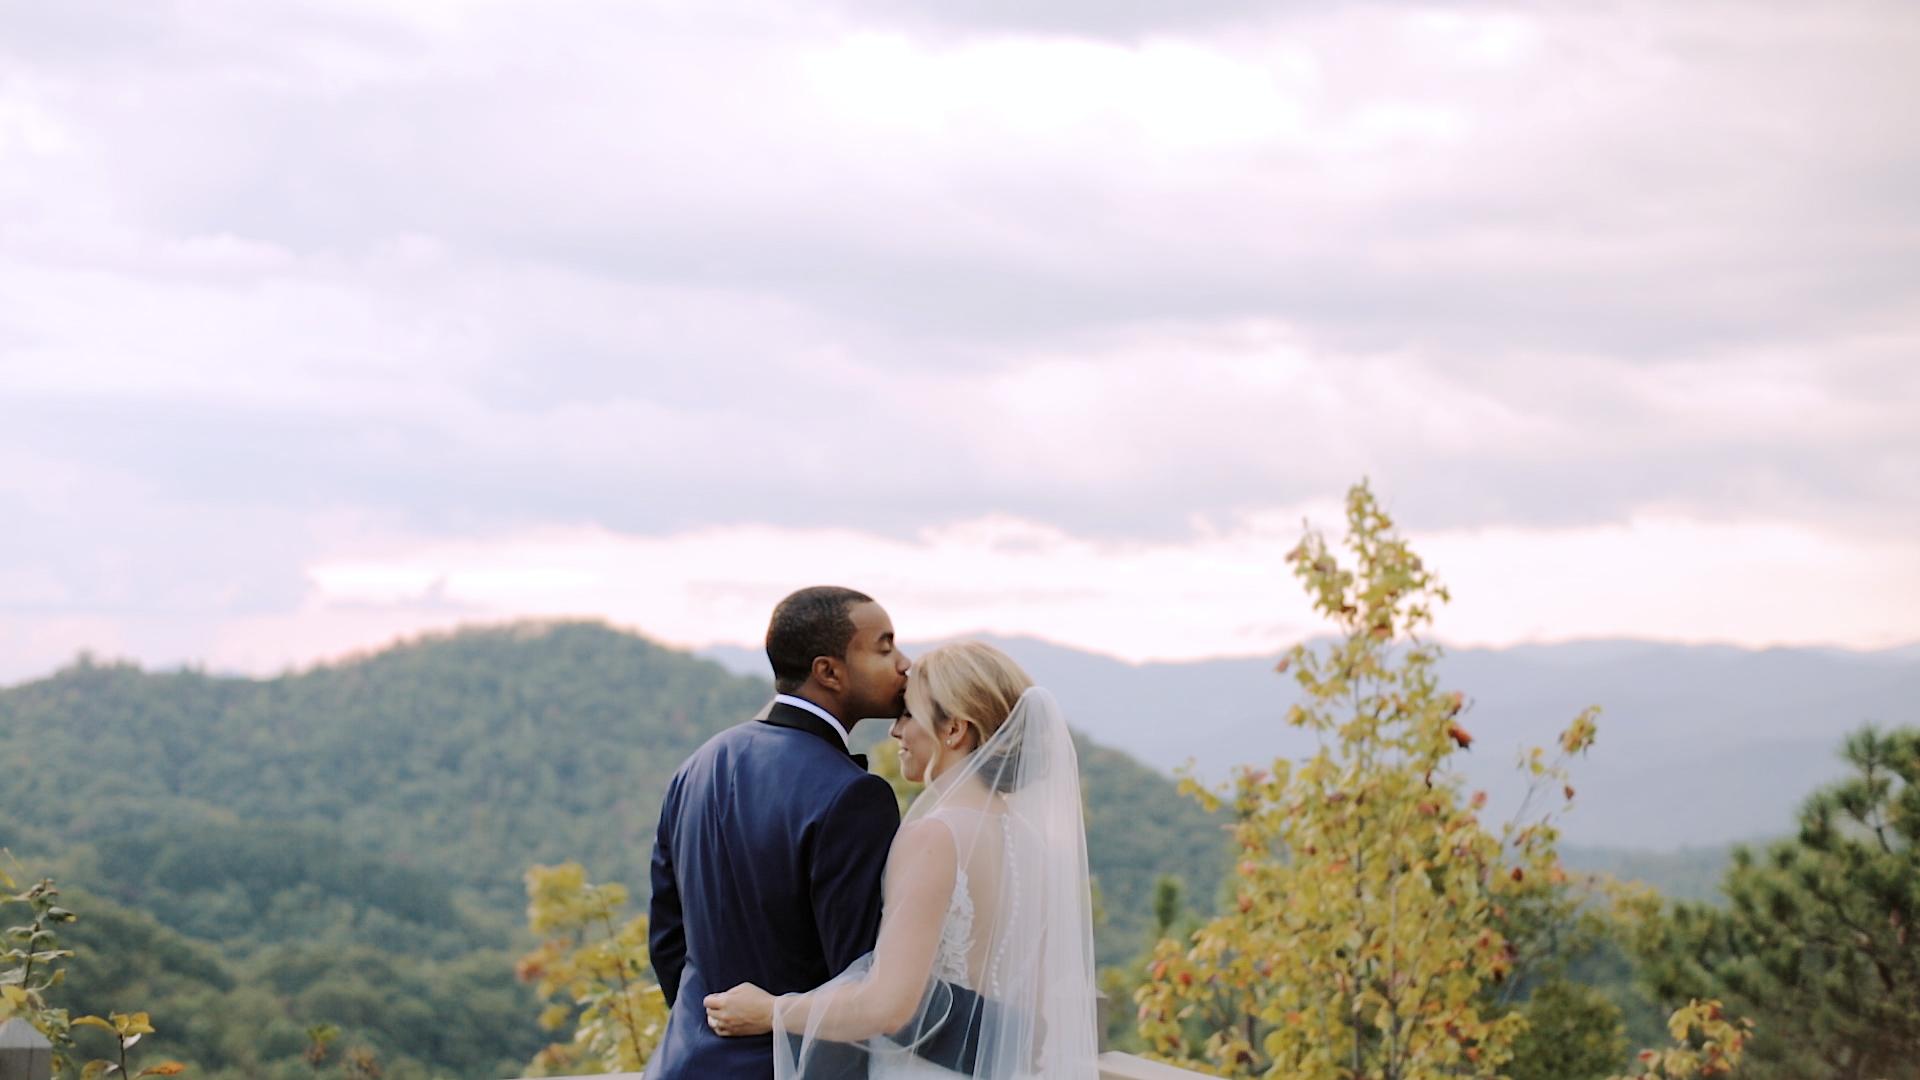 Kate + Chad | Andrews, North Carolina | Hawkesdene House